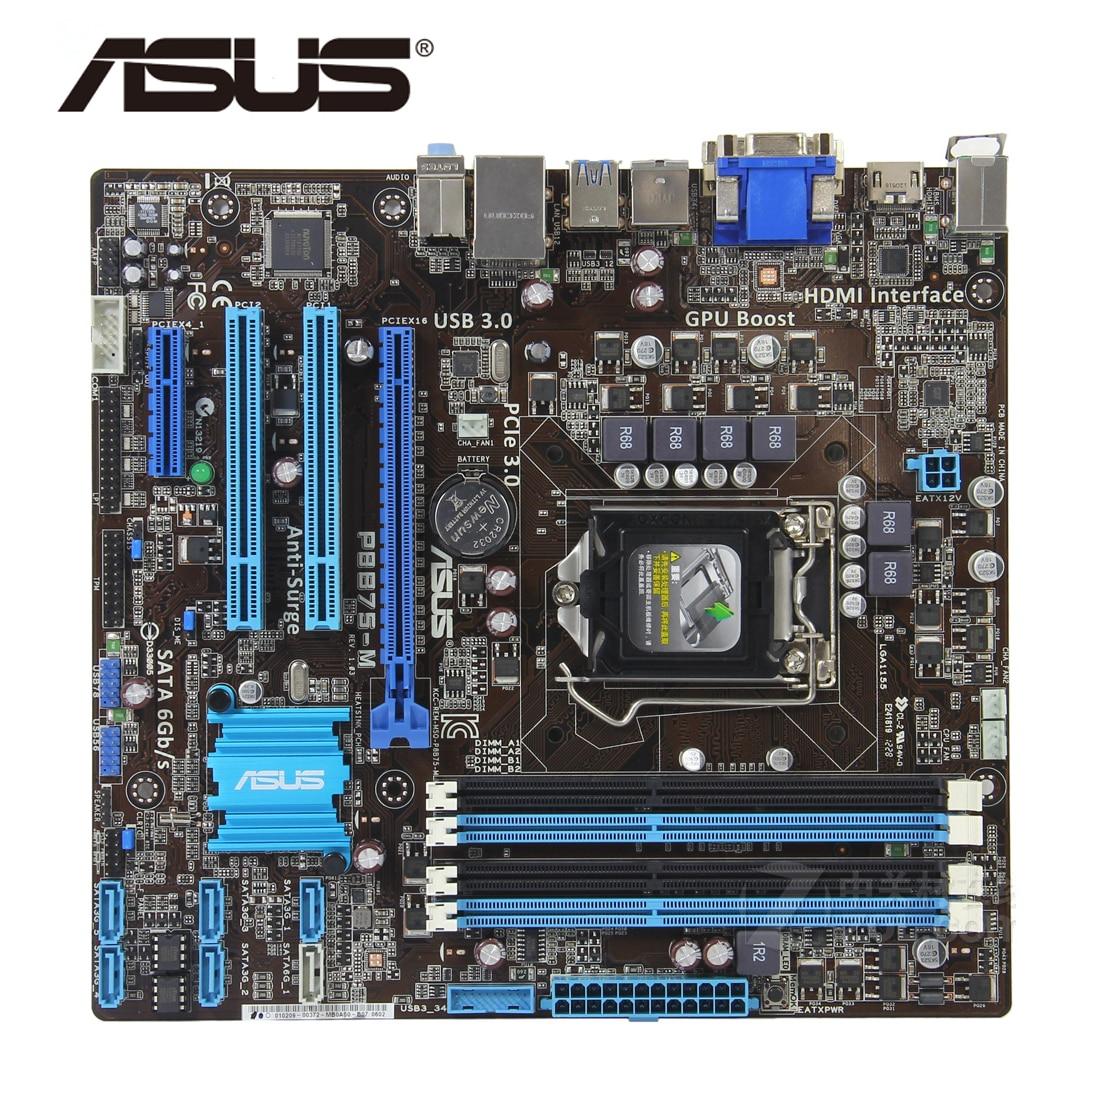 LGA 1155 B75 100% Original ASUS P8B75-M P8B75M/CSM carte mère prise SATA III 4 x DDR3 32 GB USB3.0 P8B75-M/CSM carte mère utilisée